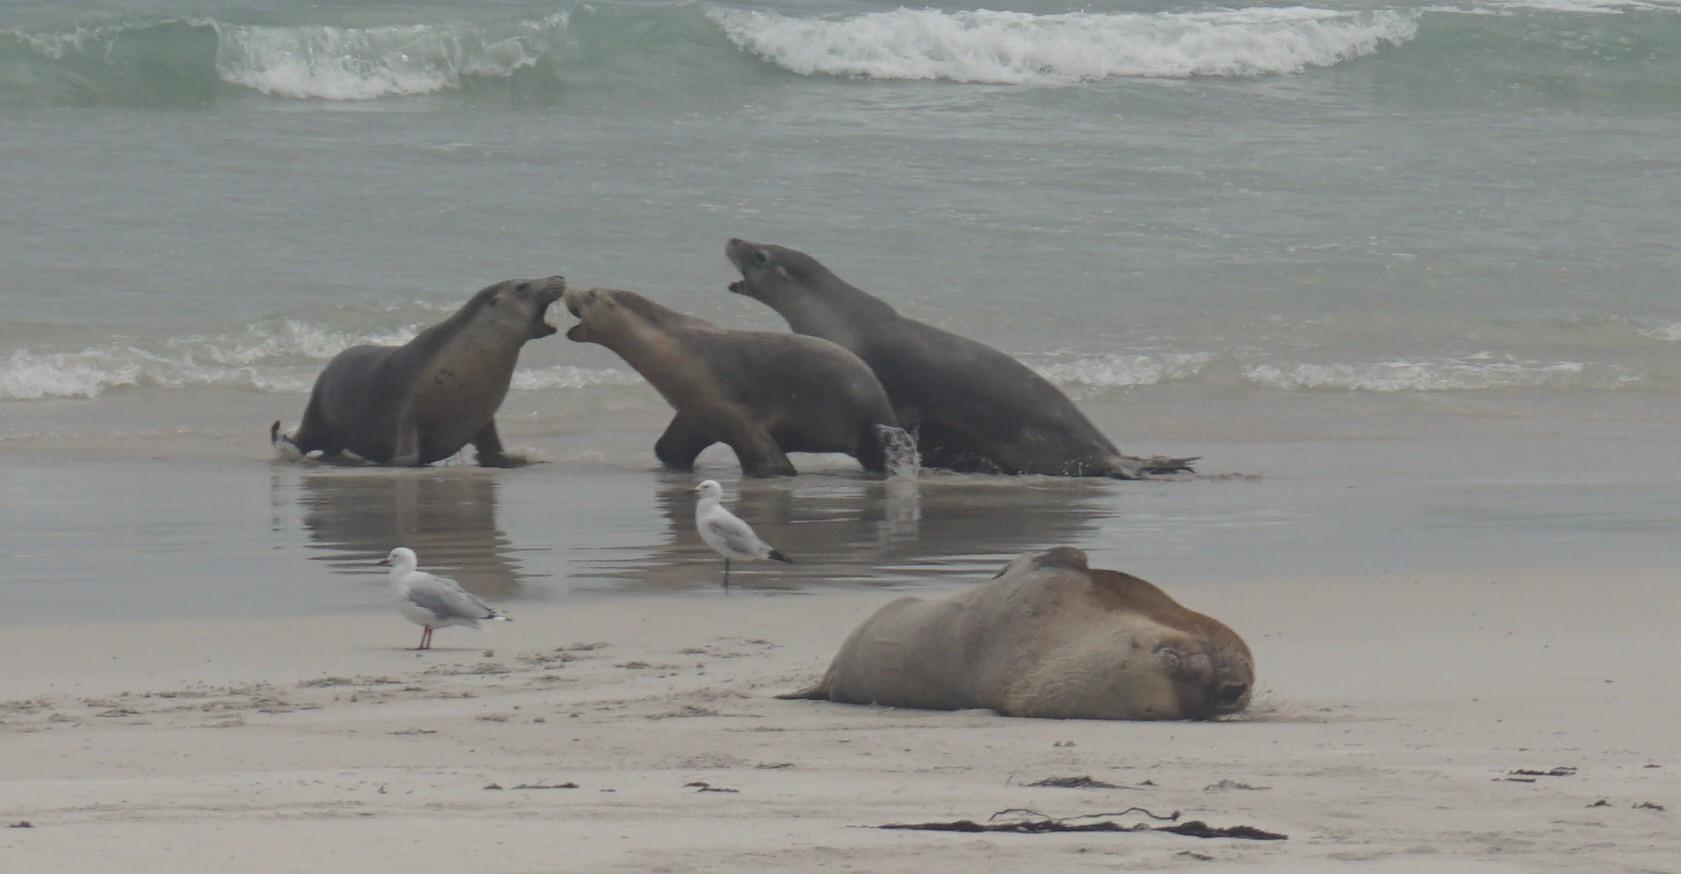 Sea lions fighting